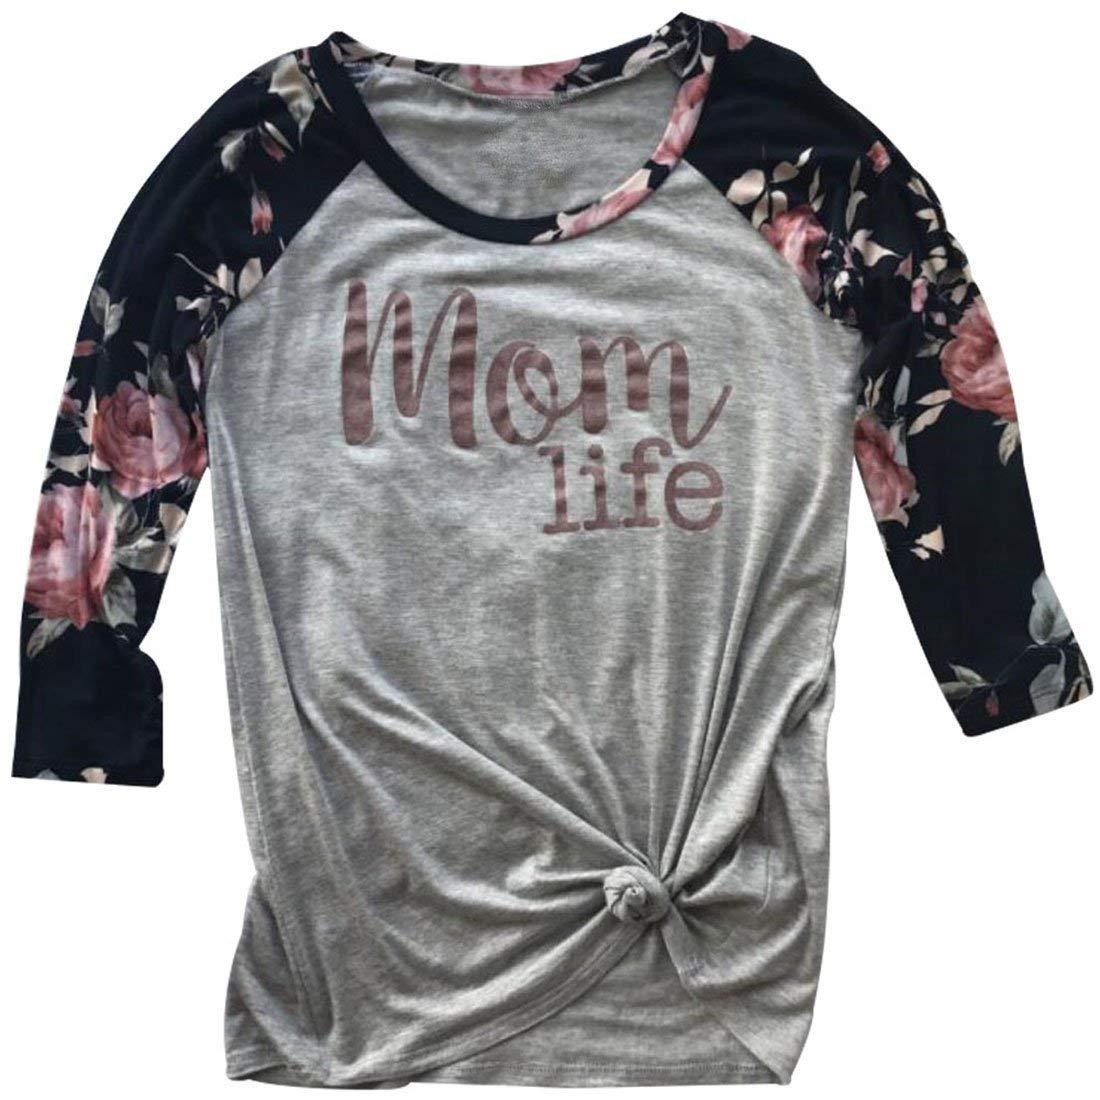 FAYALEQ Mom Life Floral Printed 3/4-Sleeve Raglan T-Shirt Women Casual O-Neck Top Blouse